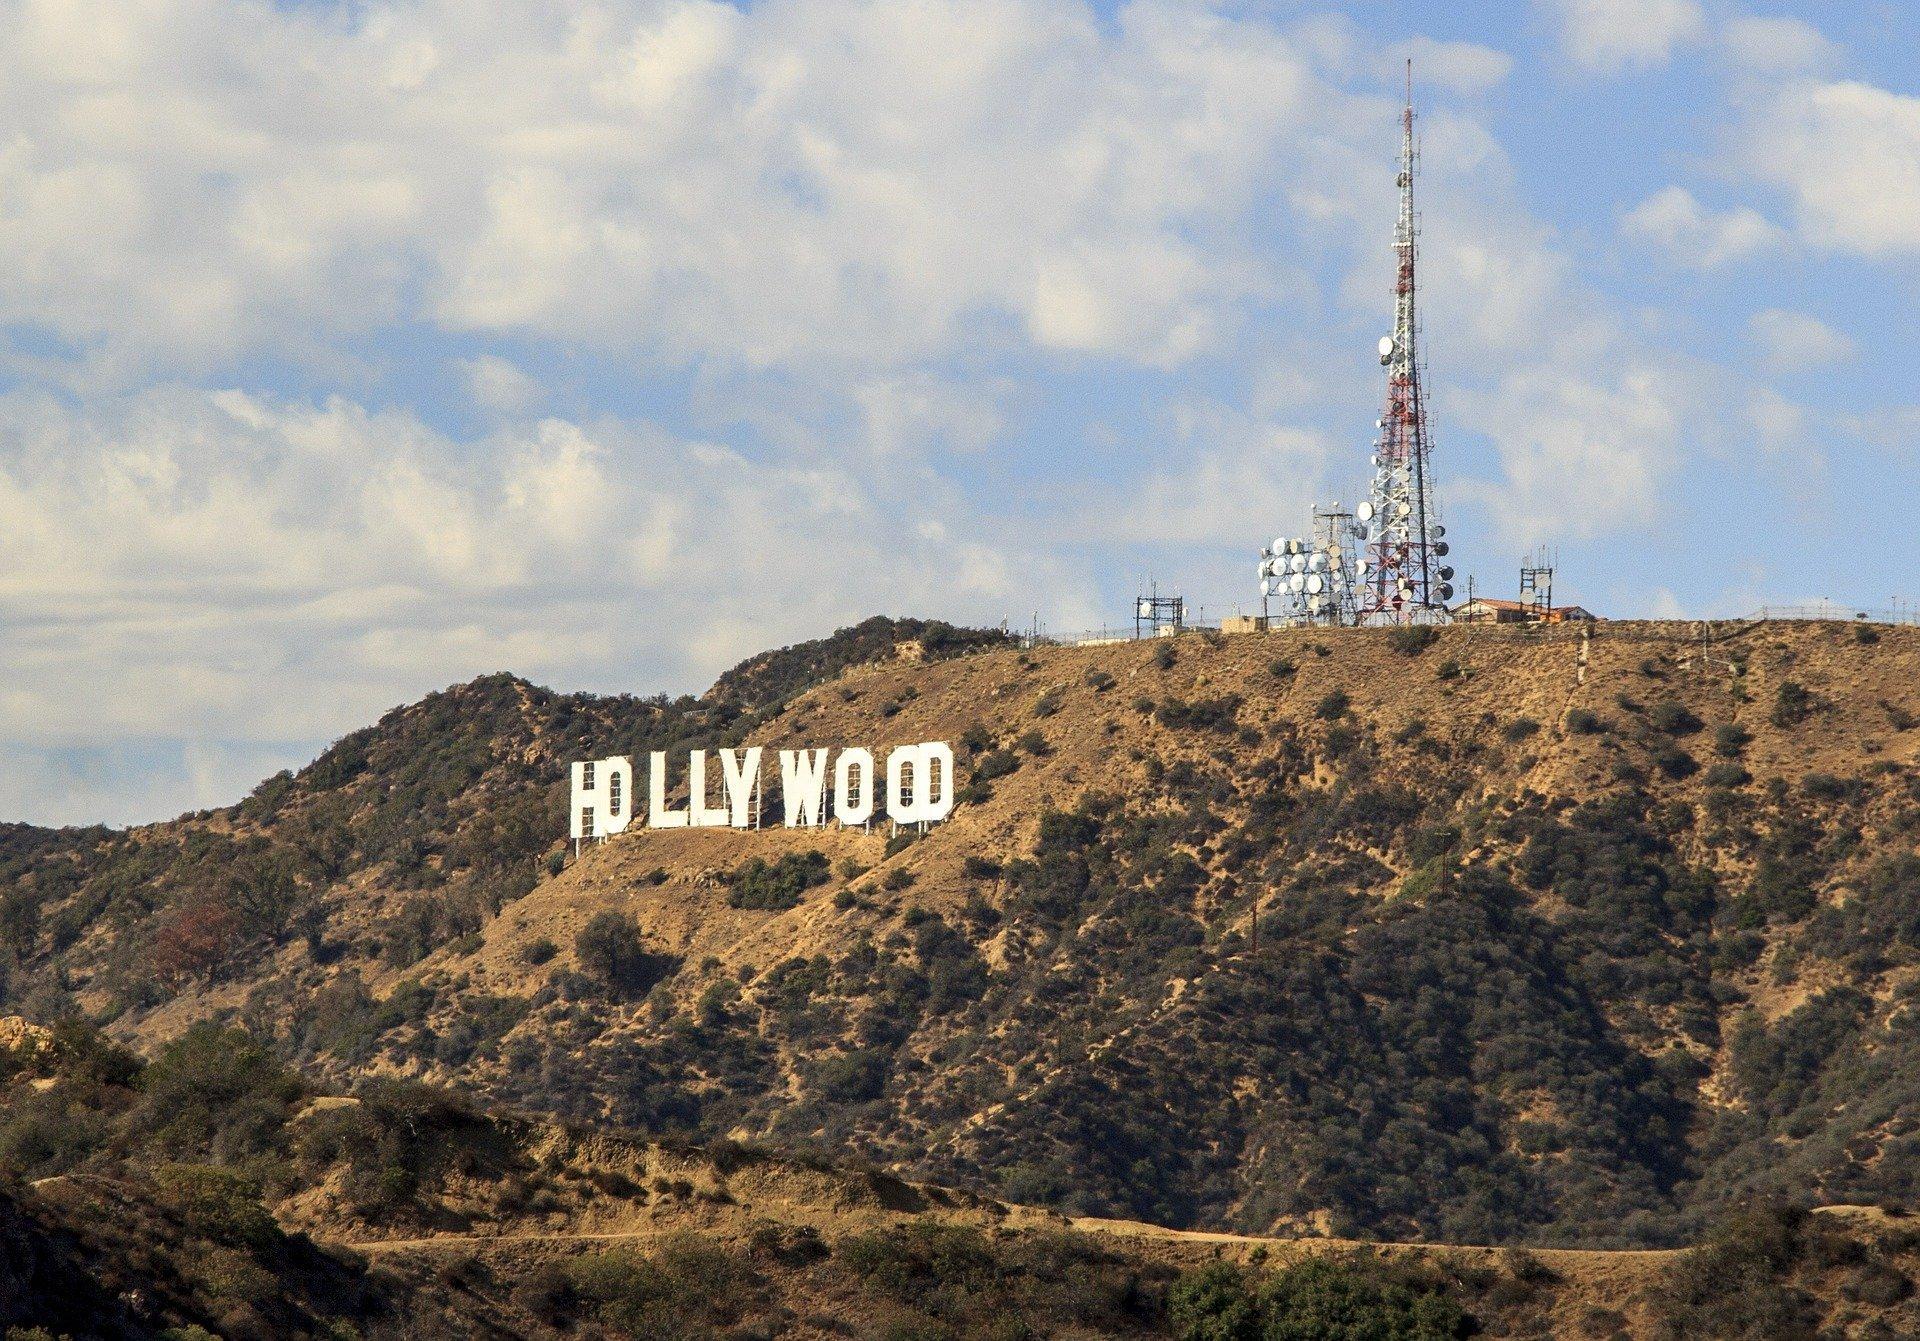 Murder, She Wrights' Writing Tip Based on Hollywood Ending (Episode 4)